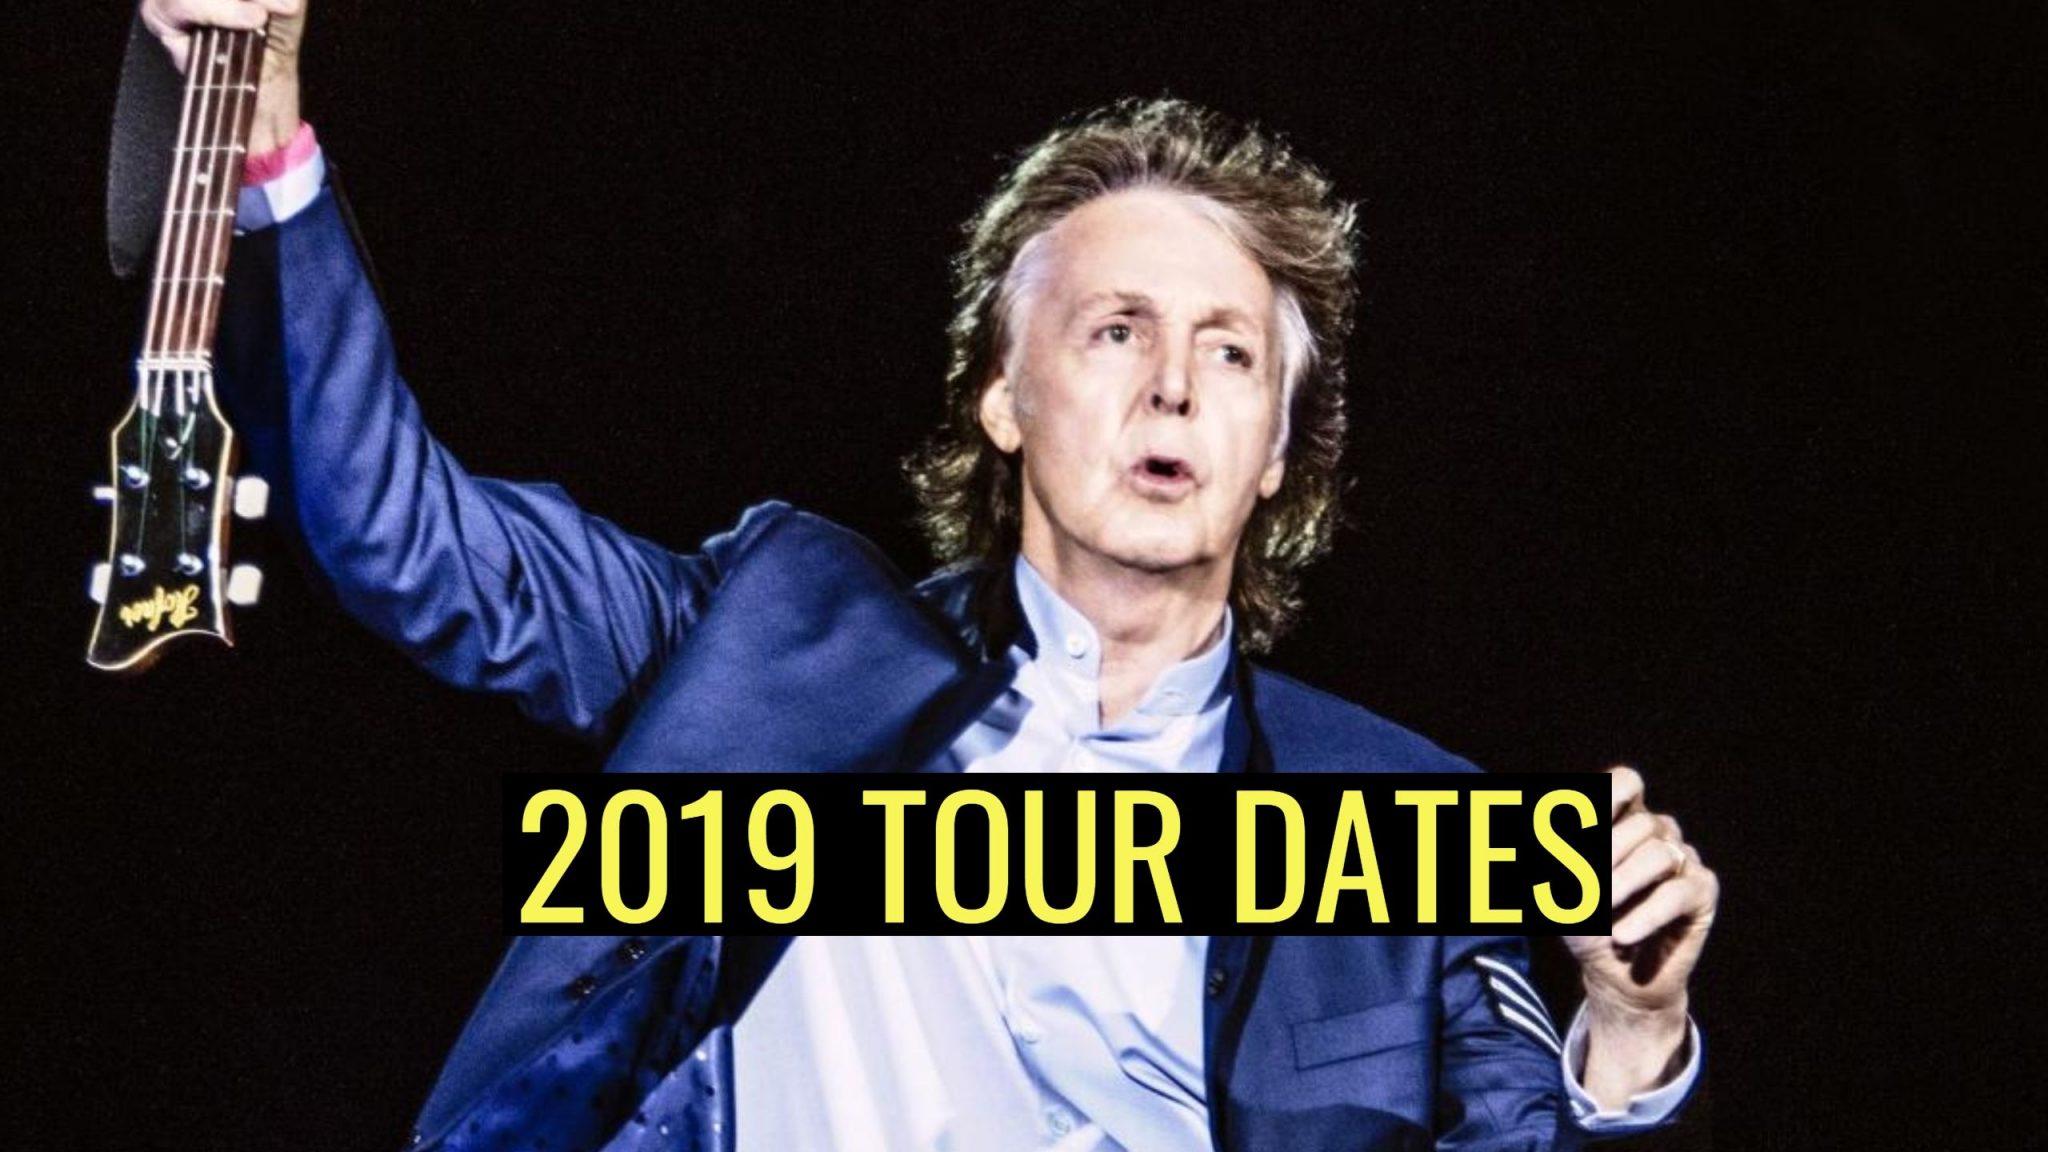 Paul McCartney 2019 tour dates